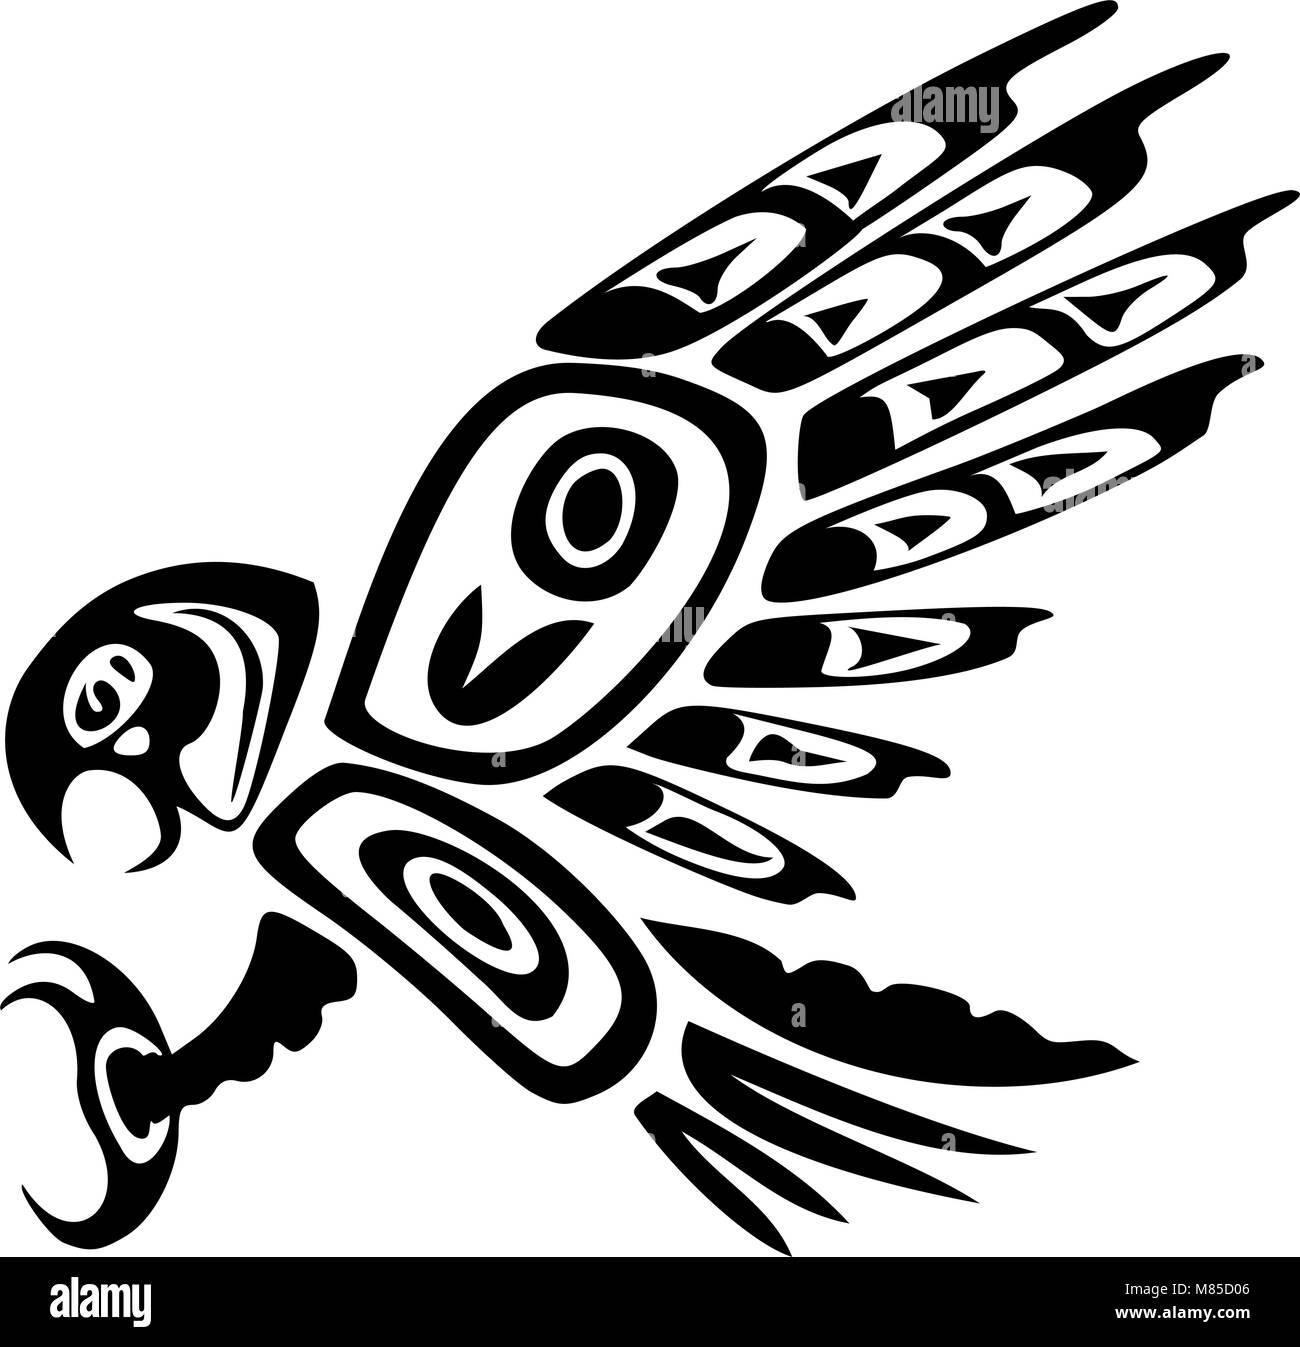 A Tribal Haida Eagle Tattoo Stock Vector Art Illustration